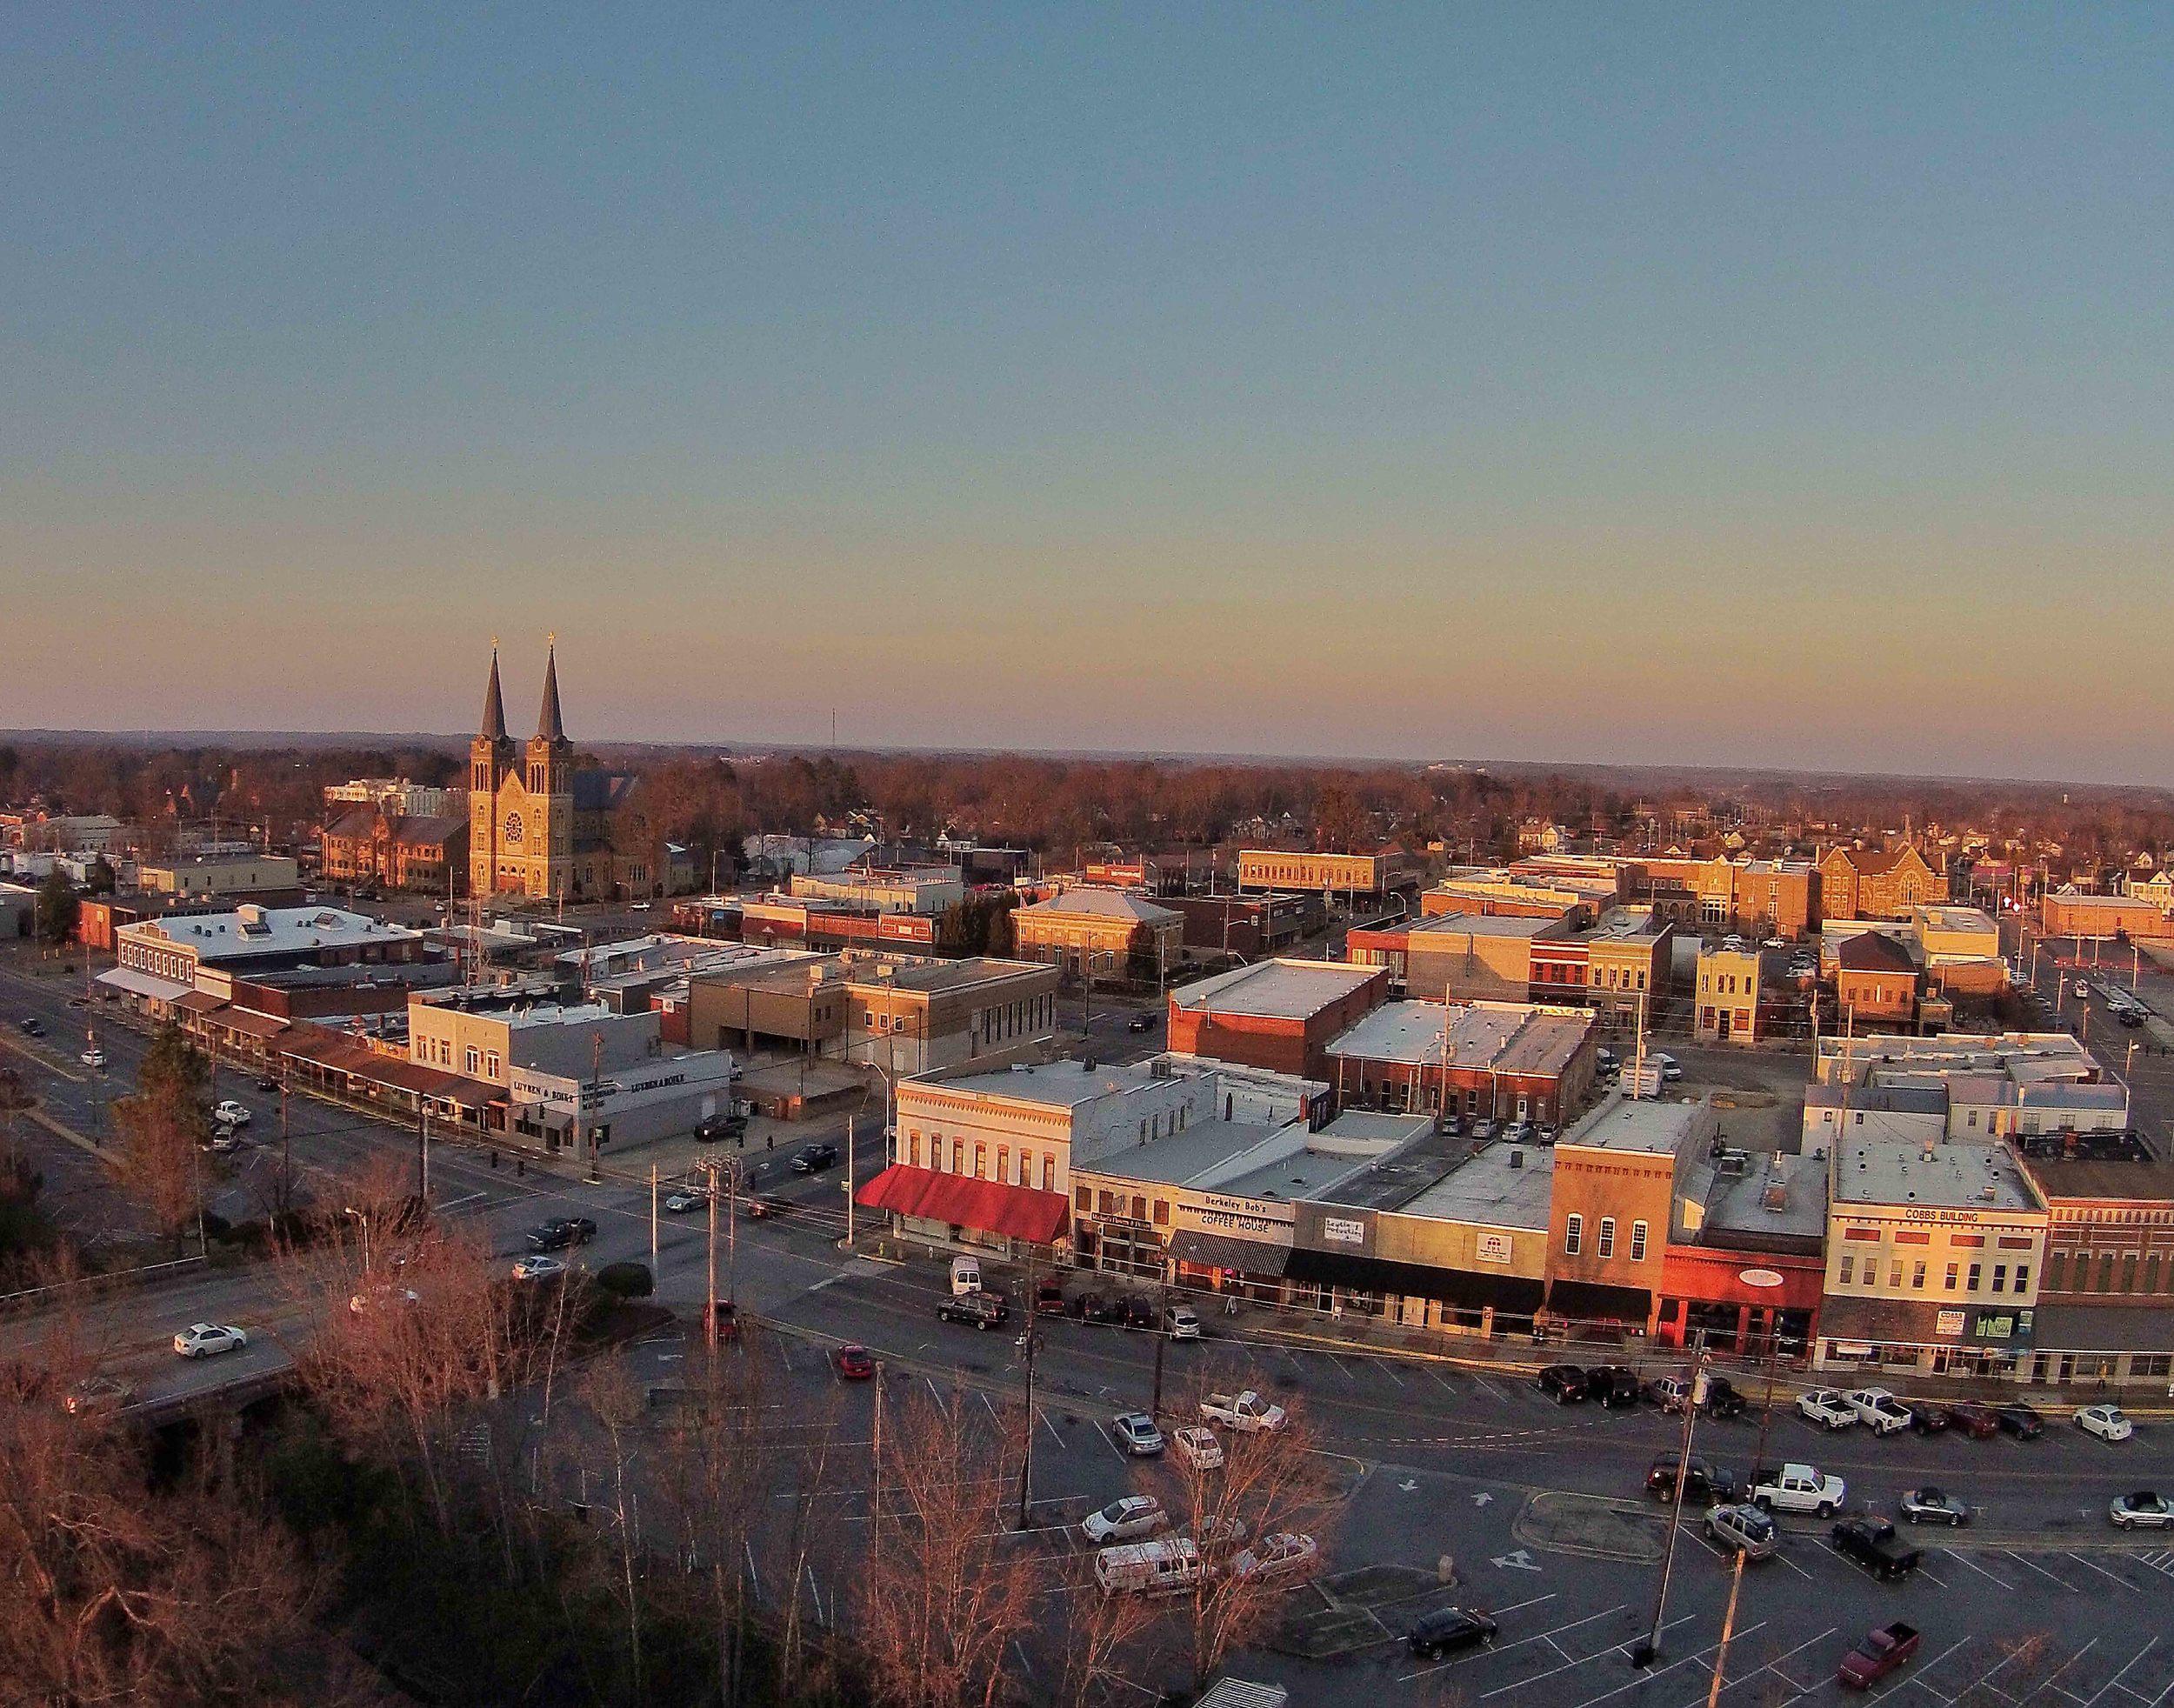 City of Cullman and Sacred Heart Church